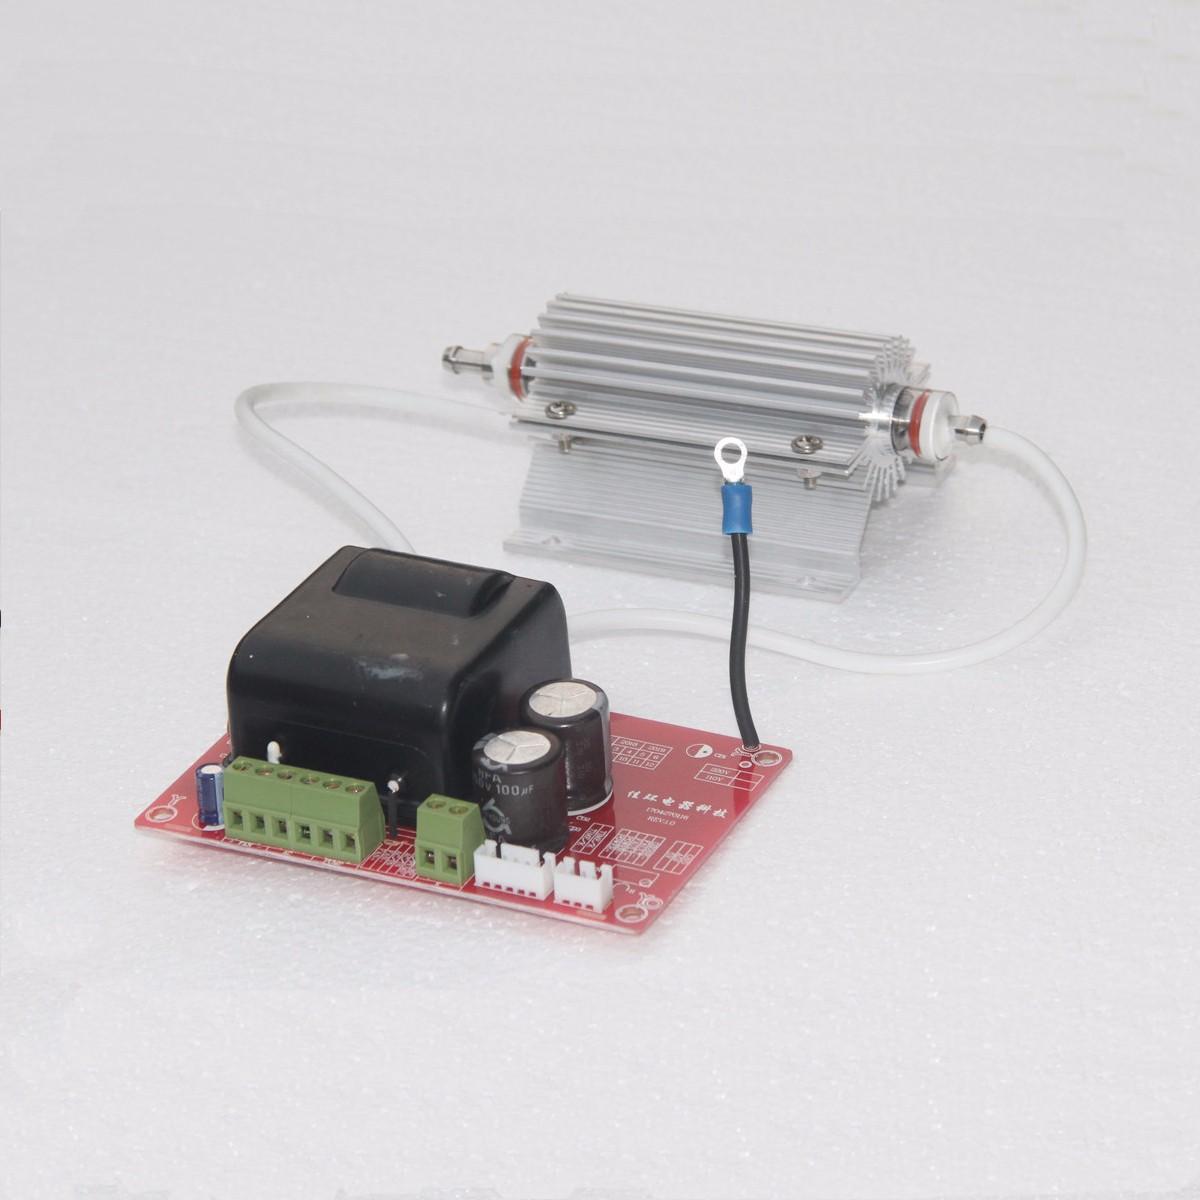 2g Ozone Generator Kits